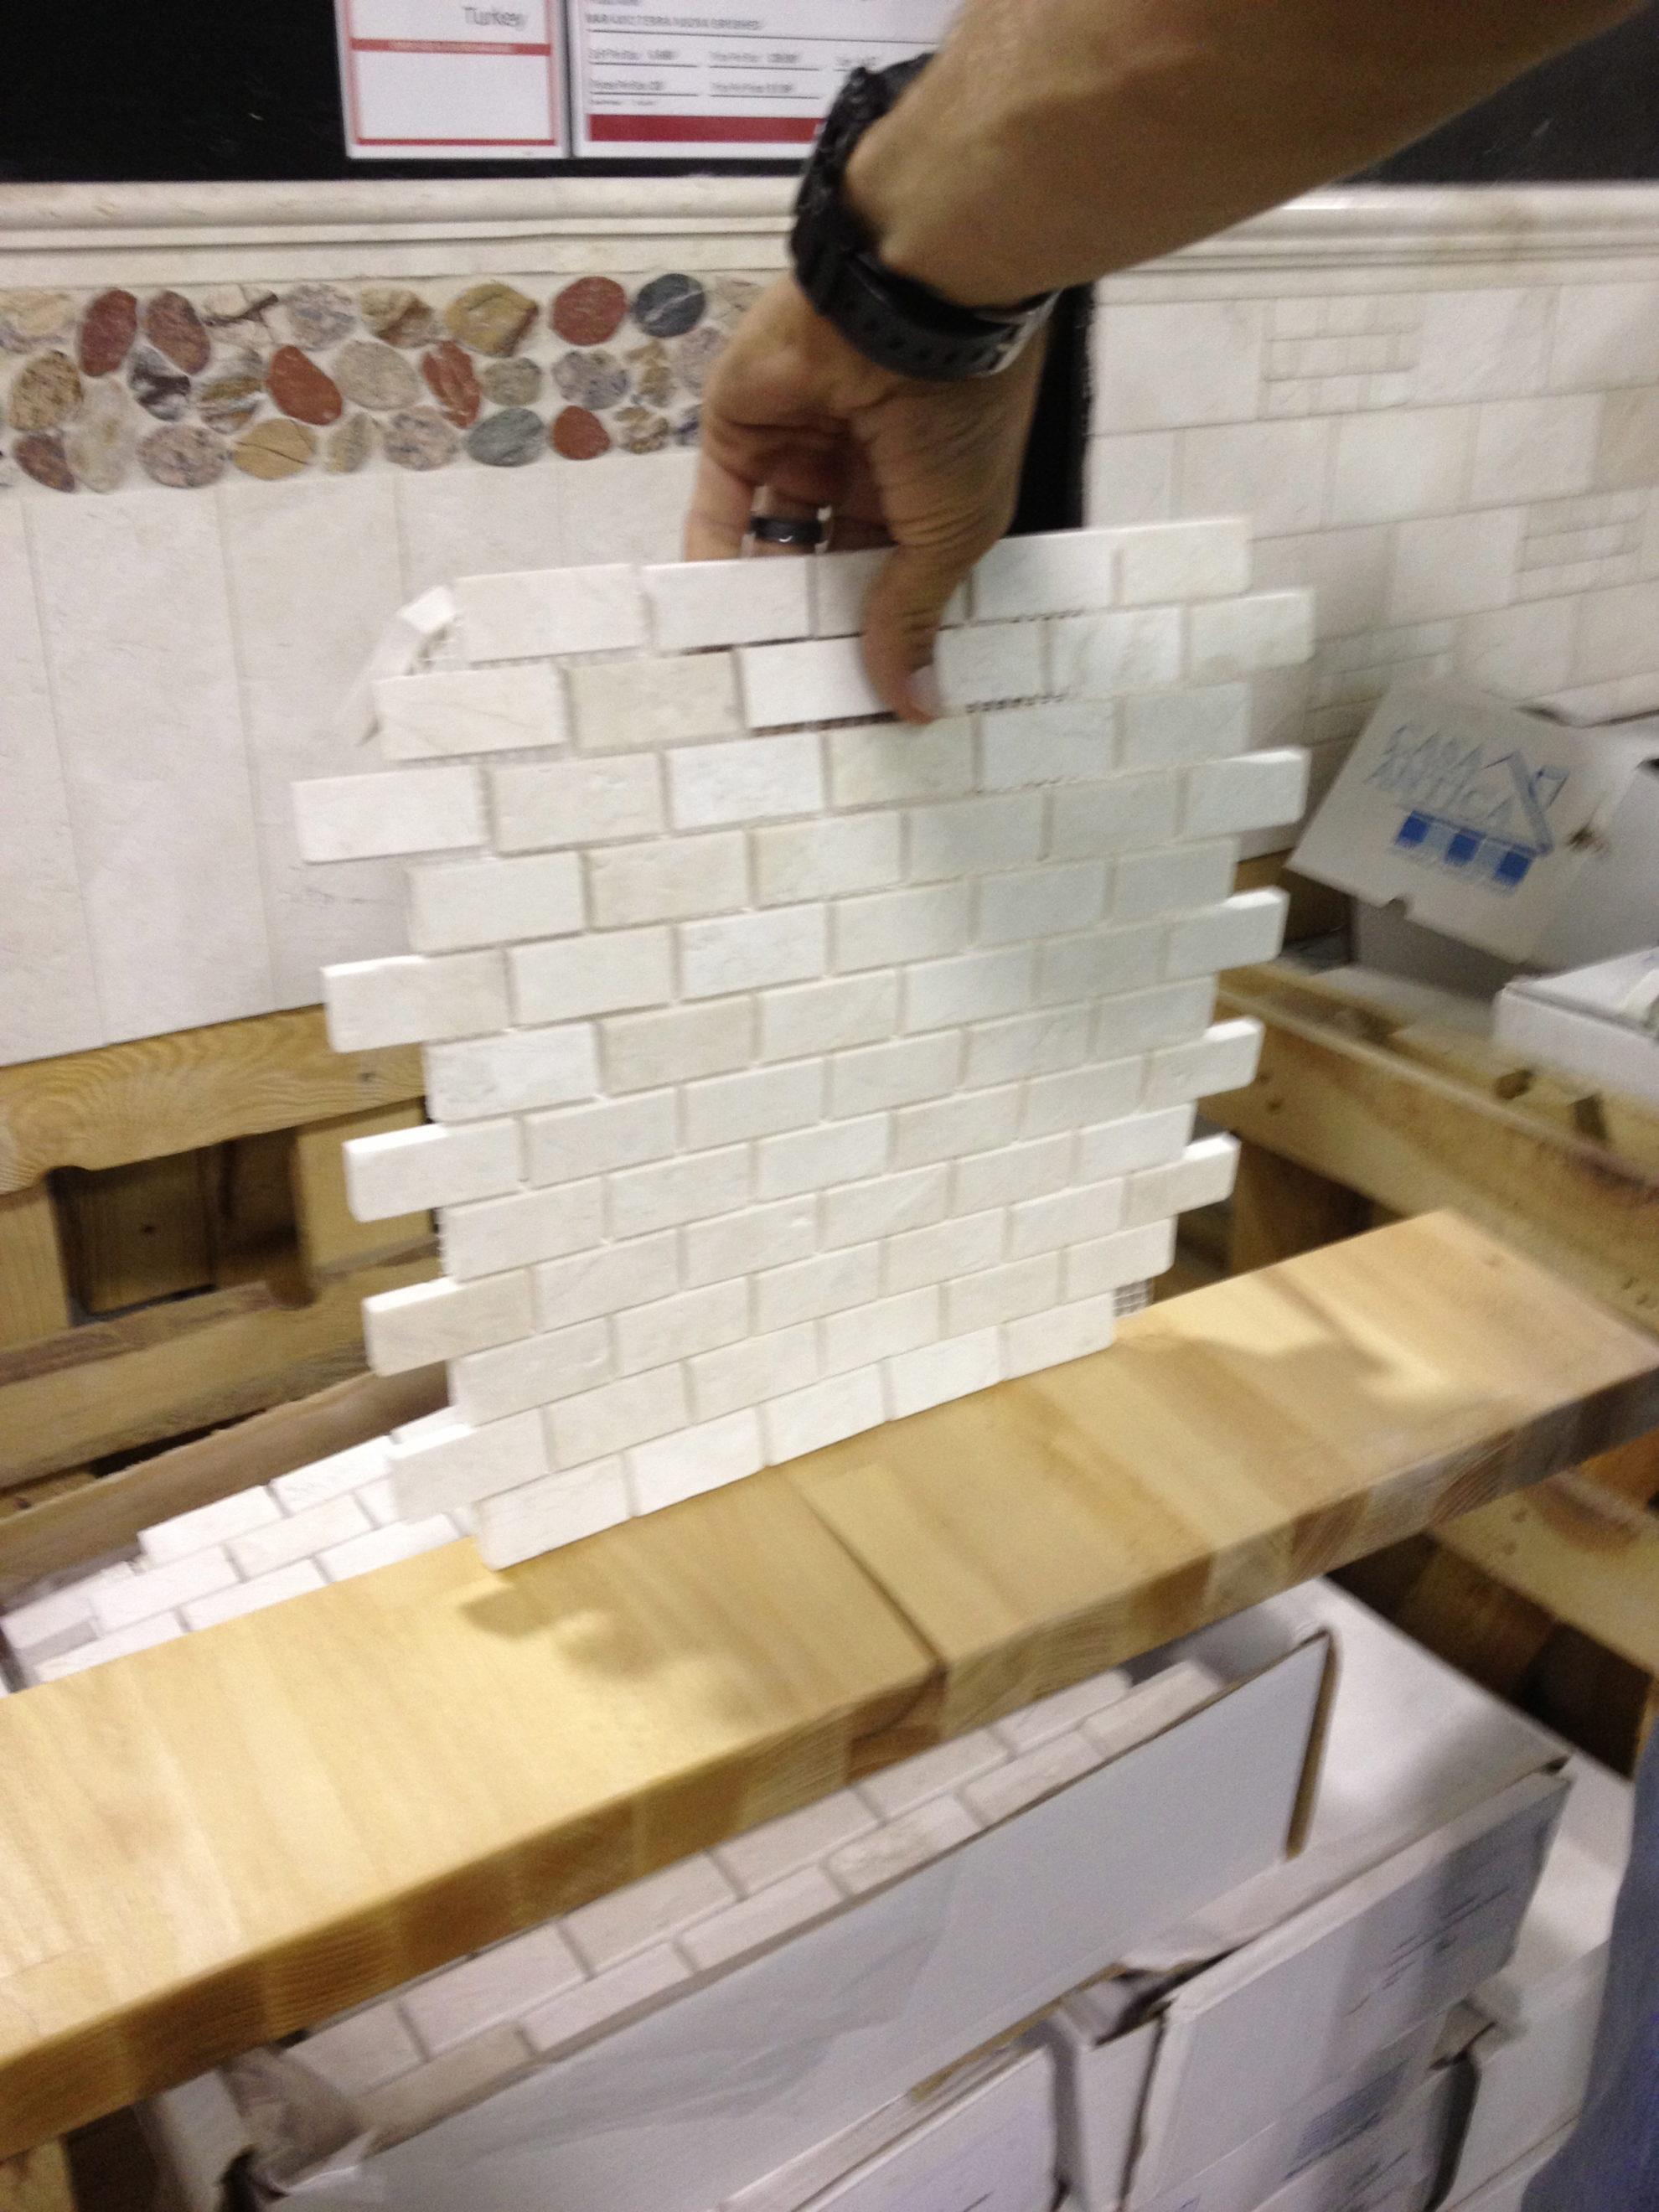 Choosing the right kitchen backsplash - Sew Woodsy